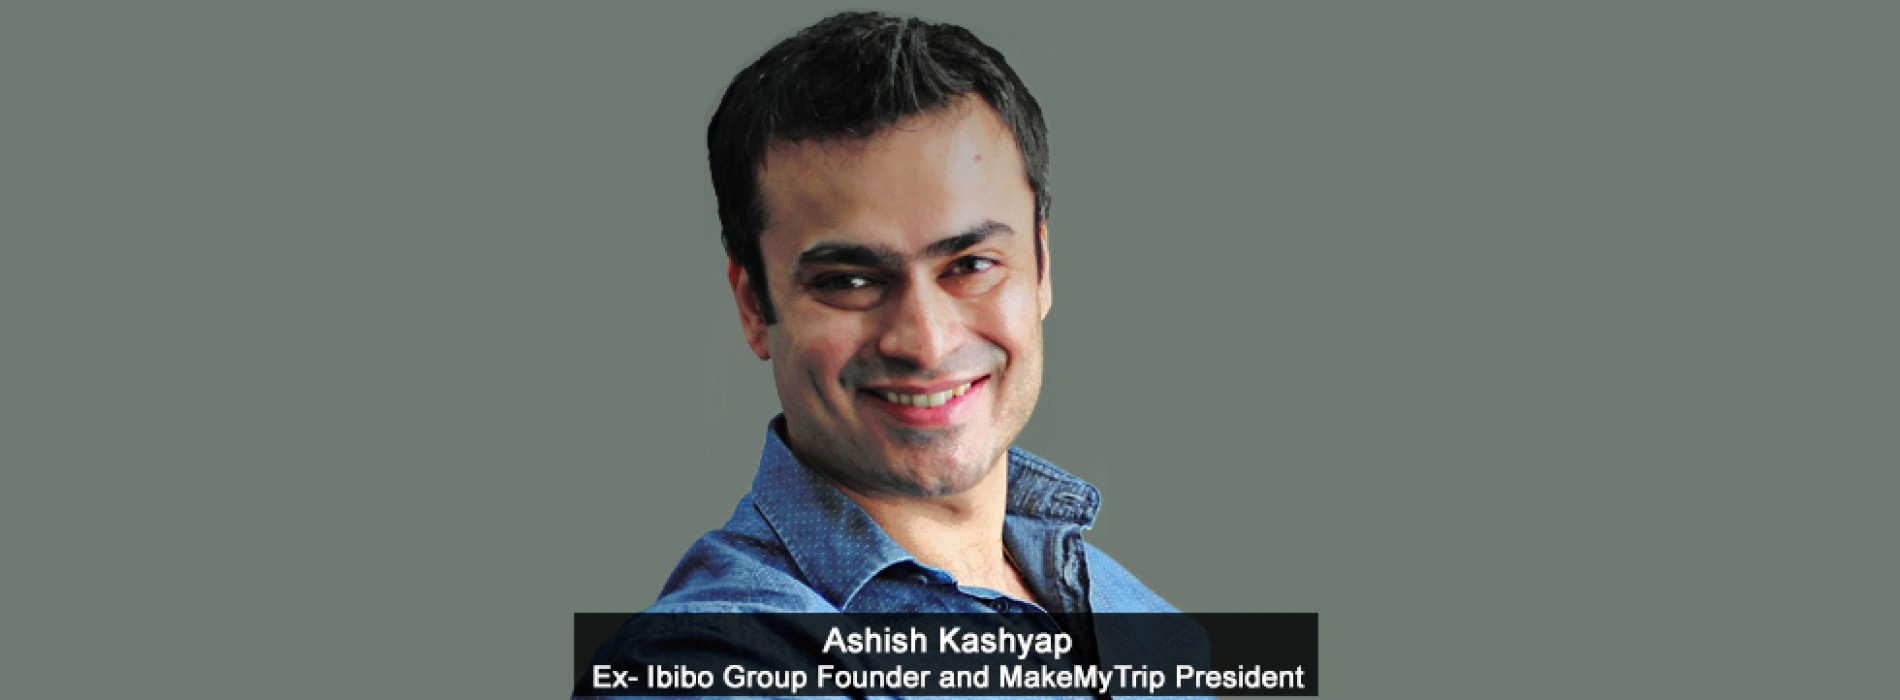 Ibibo Group Founder and MakeMyTrip President Ashish Kashyap resigns